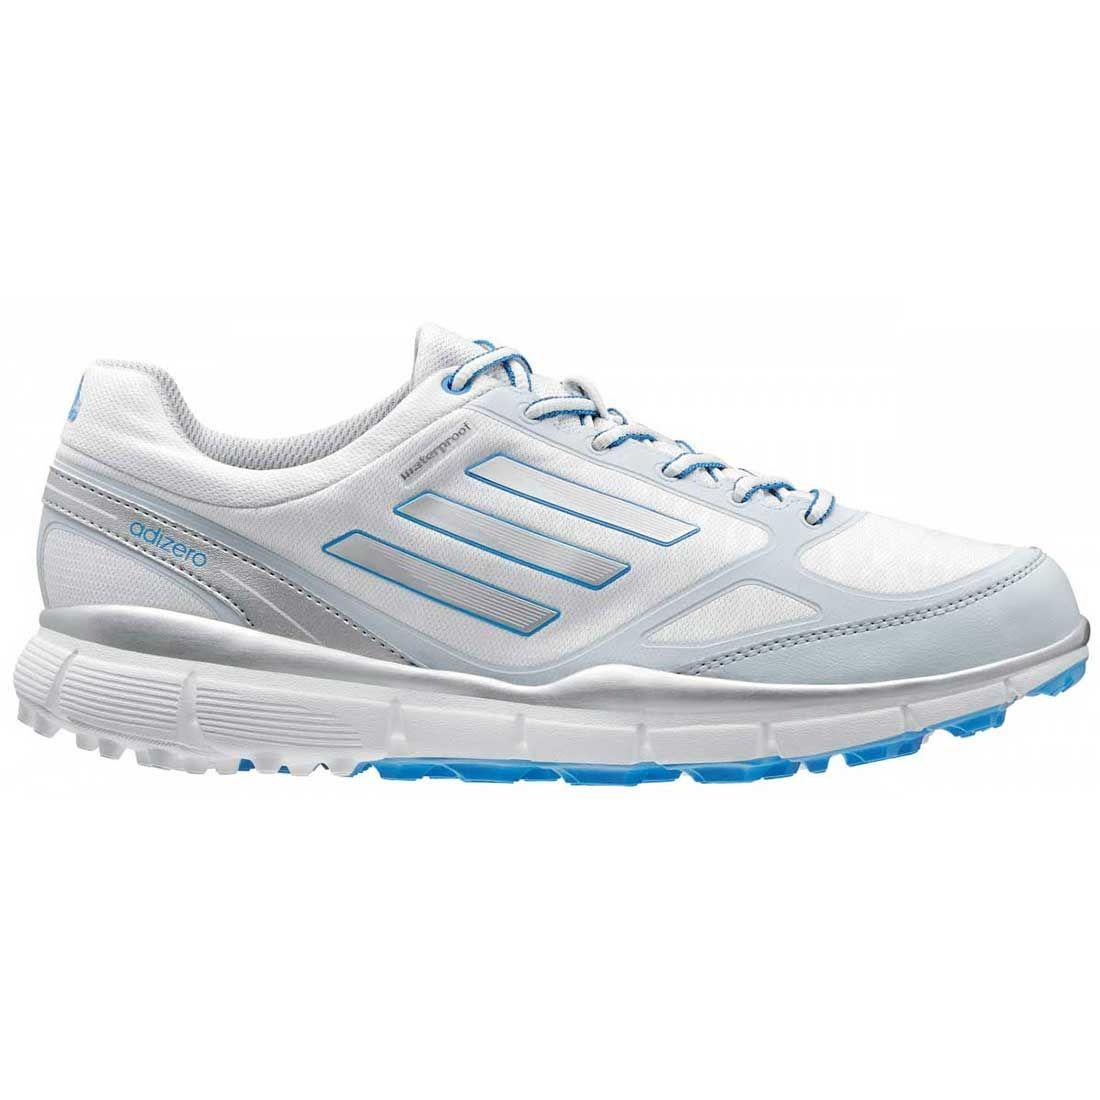 Buy Adidas Women's AdiZero Sport 3 Golf Shoes White/Silver   Golf ...